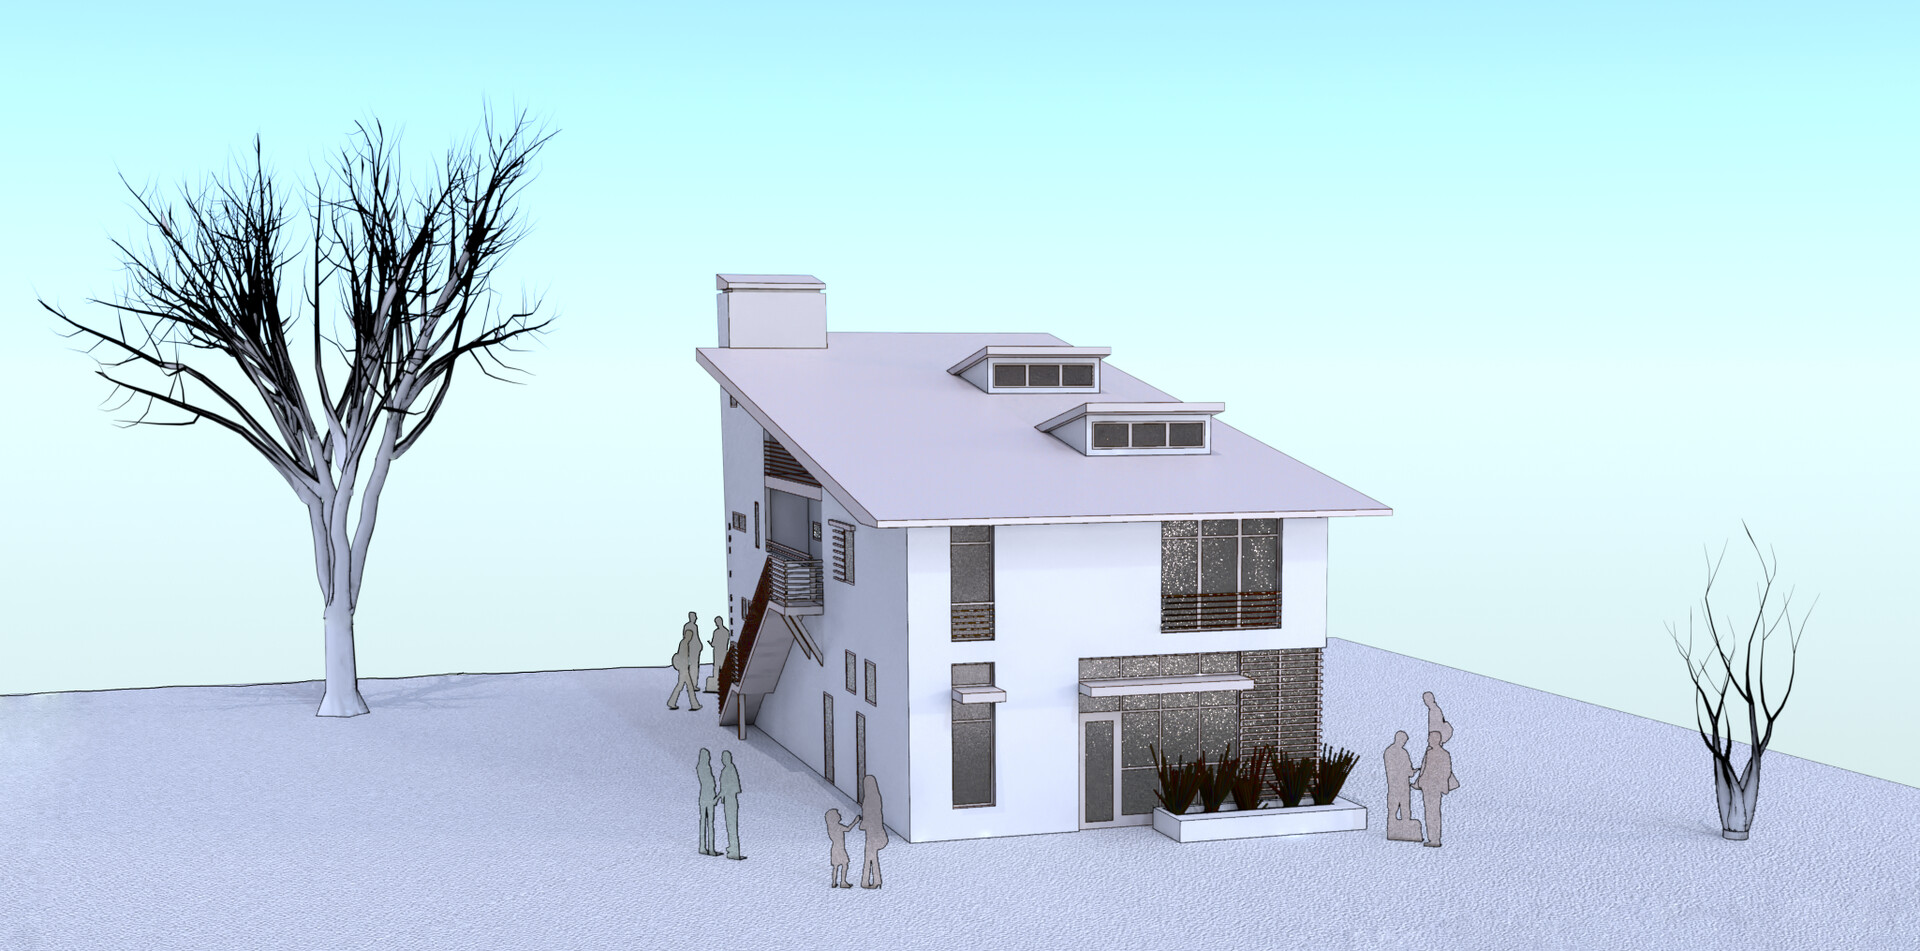 Unbuilt Gallery - White Massing - With Entourage